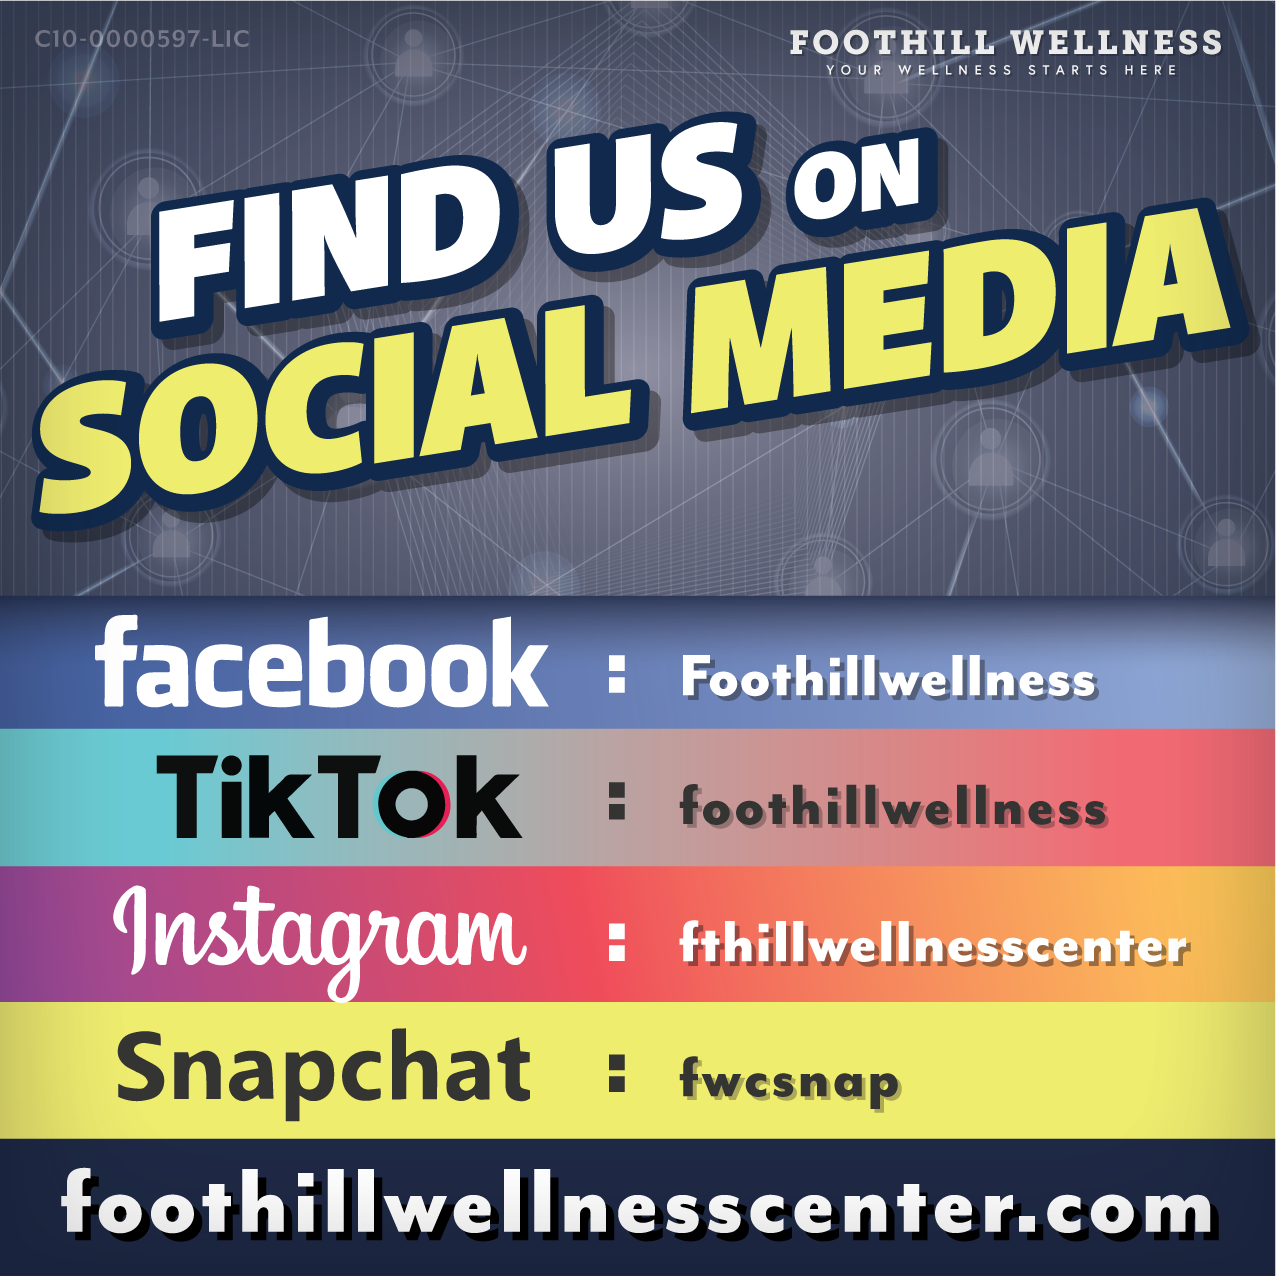 FWC Social Media Info Flyer-03